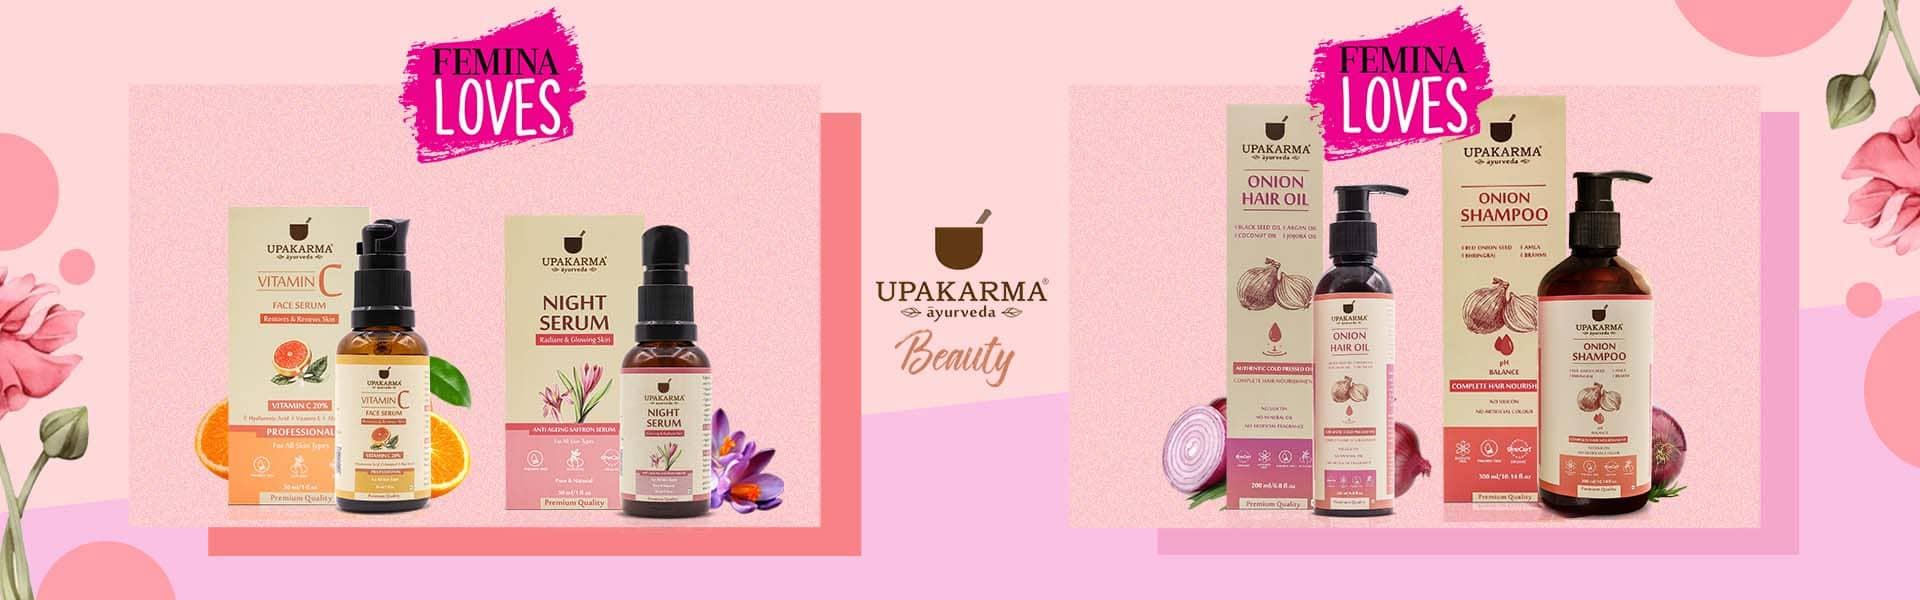 beauty products, upakarma ayurveda